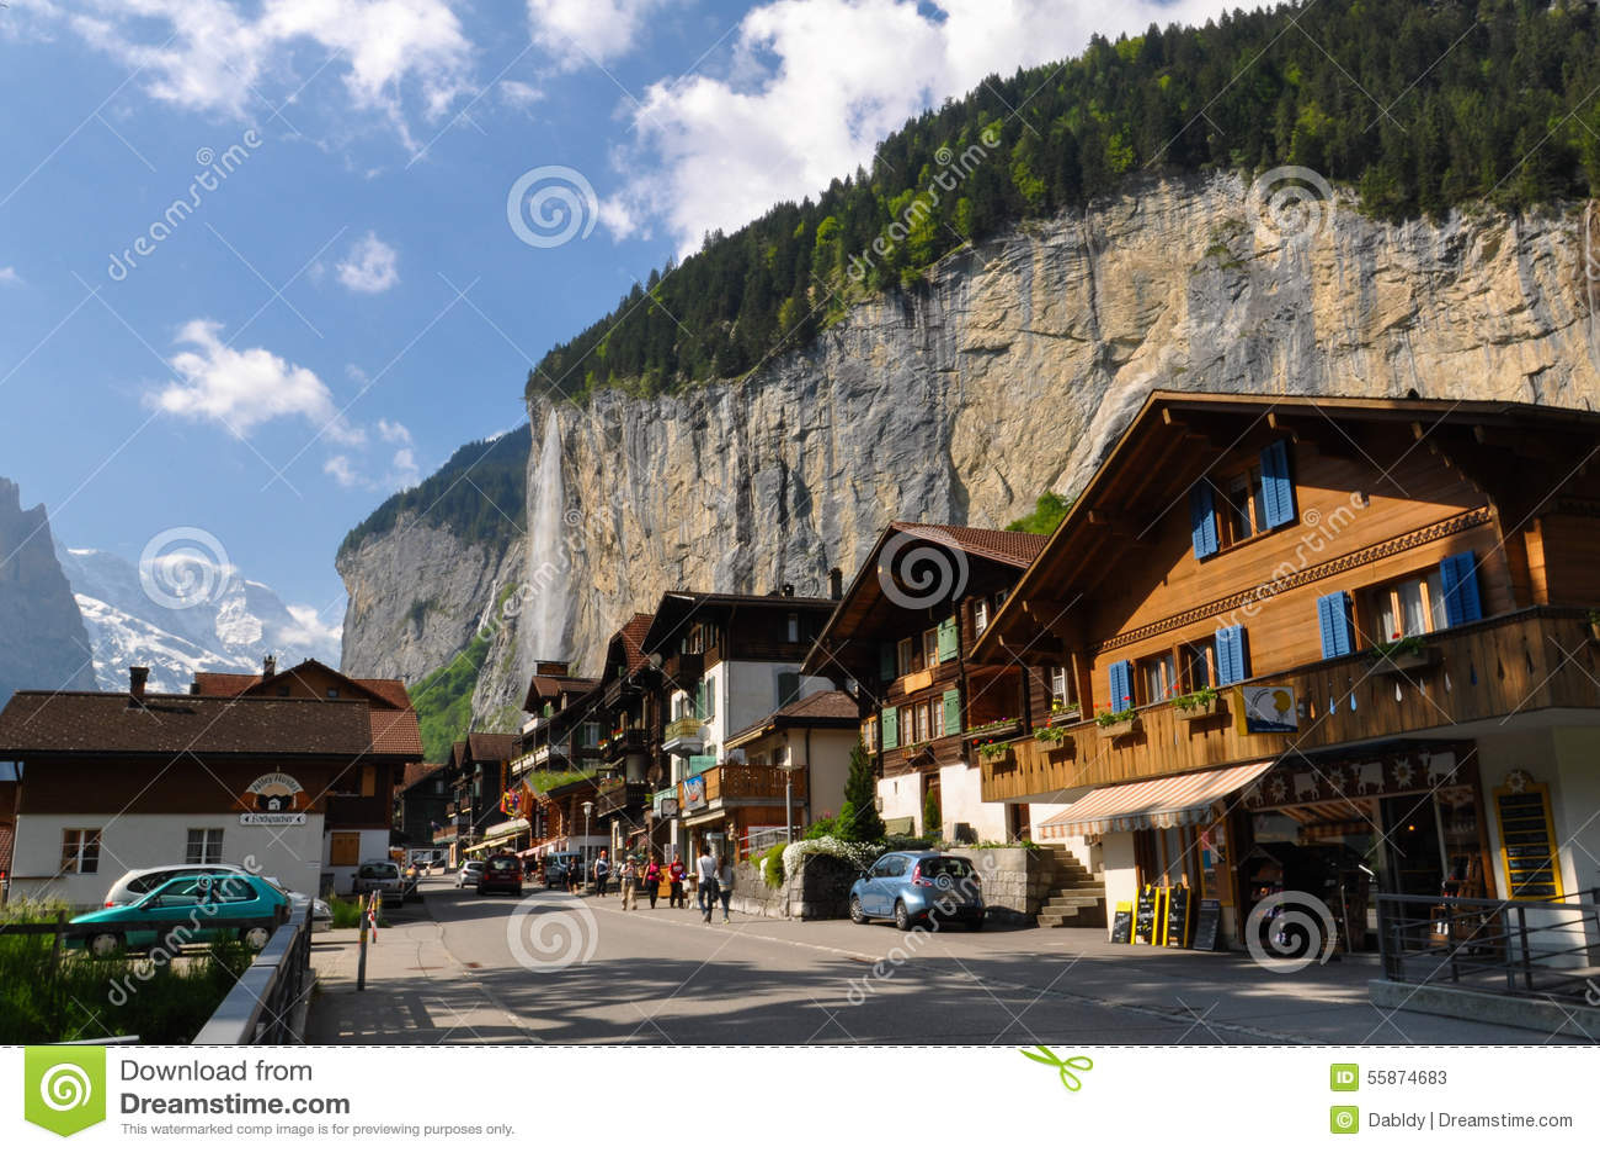 Lauterbrunnen Town In The Beautiful Valley Of Swiss Alps